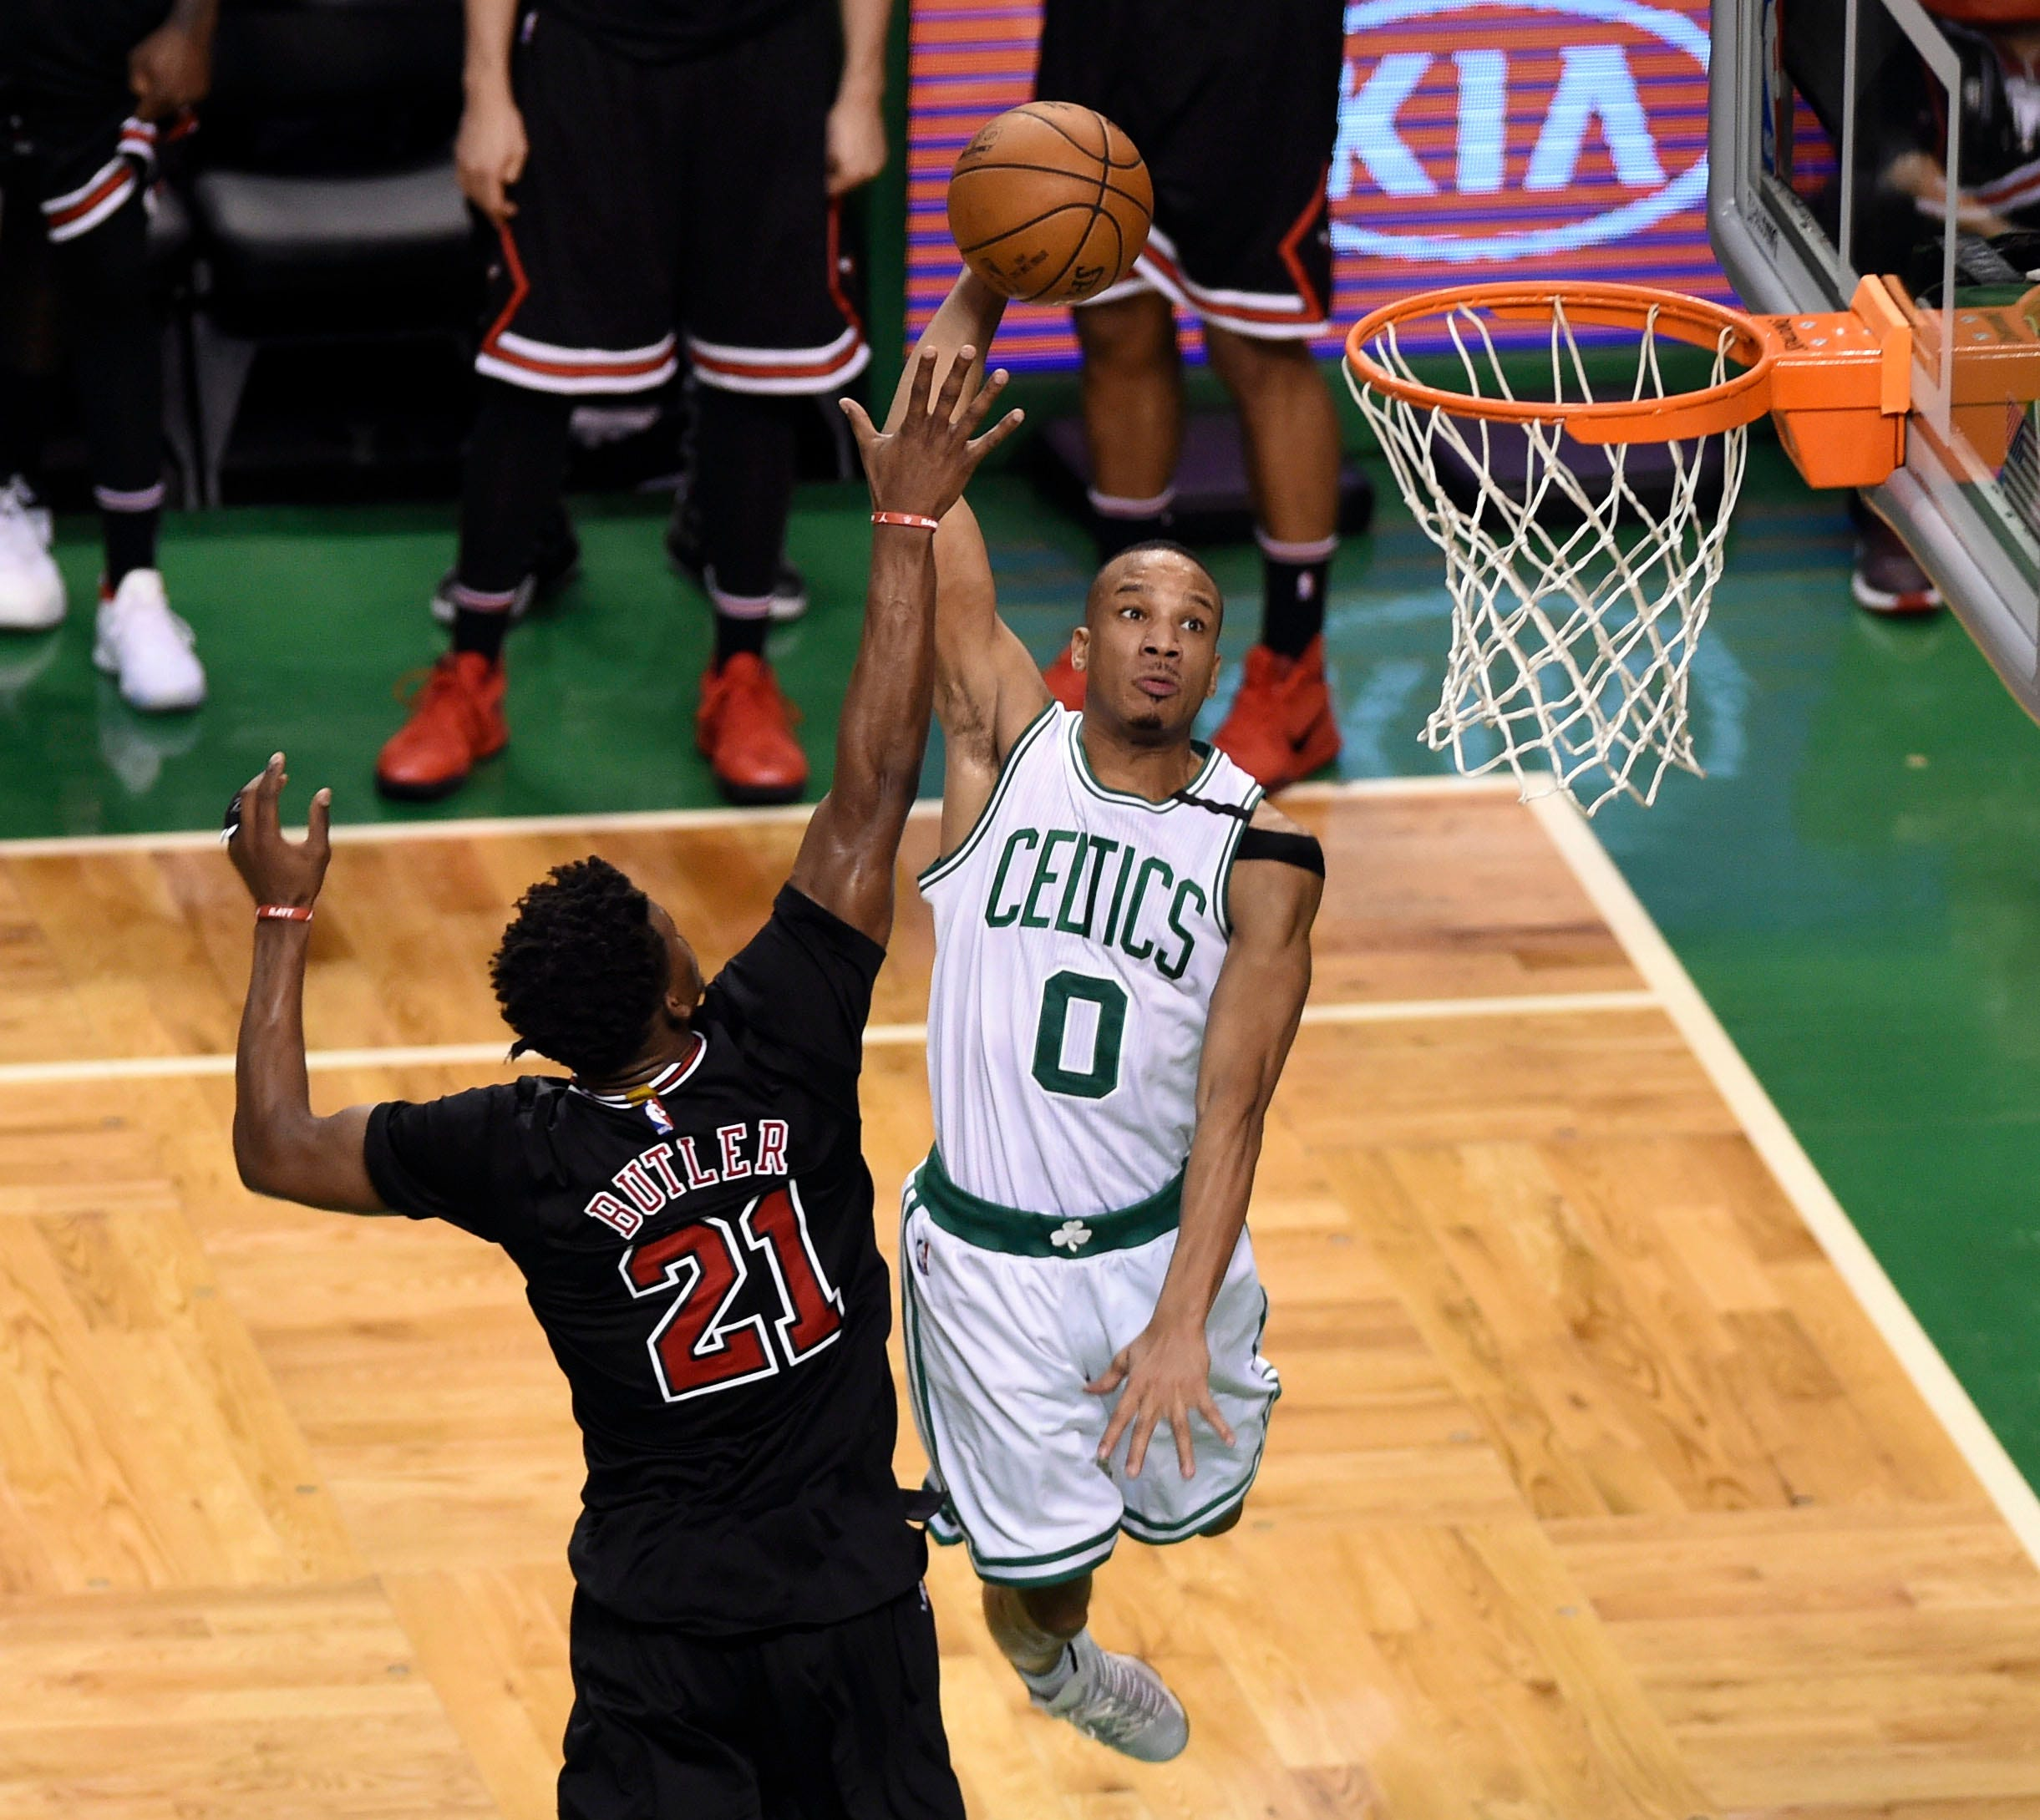 Top-seeded Celtics headline trio of Friday's elimination games